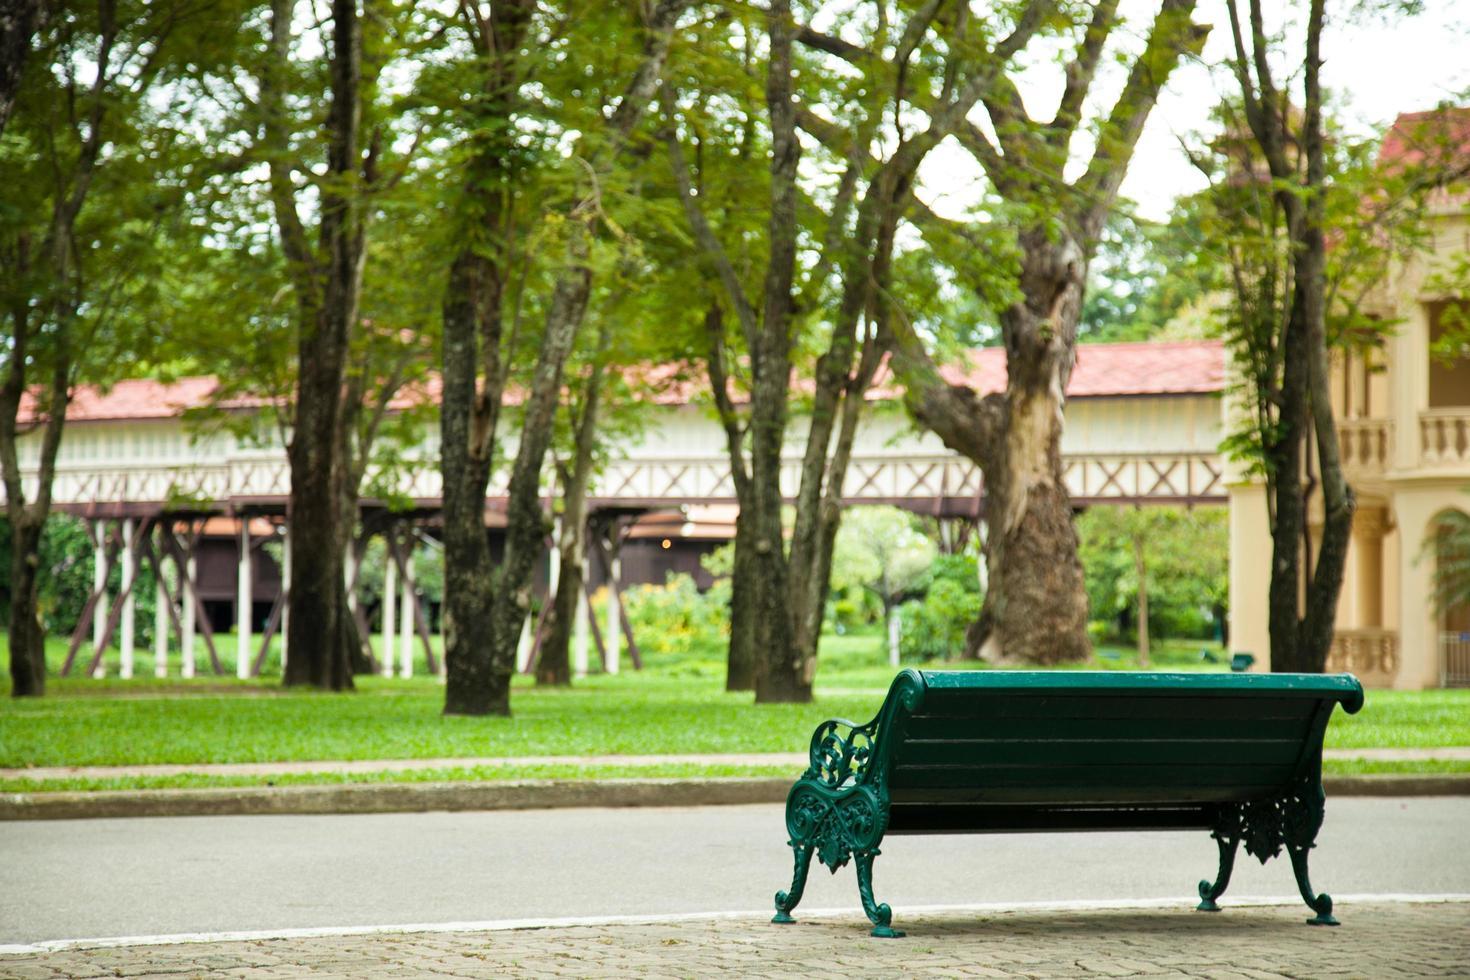 panchina nel parco foto